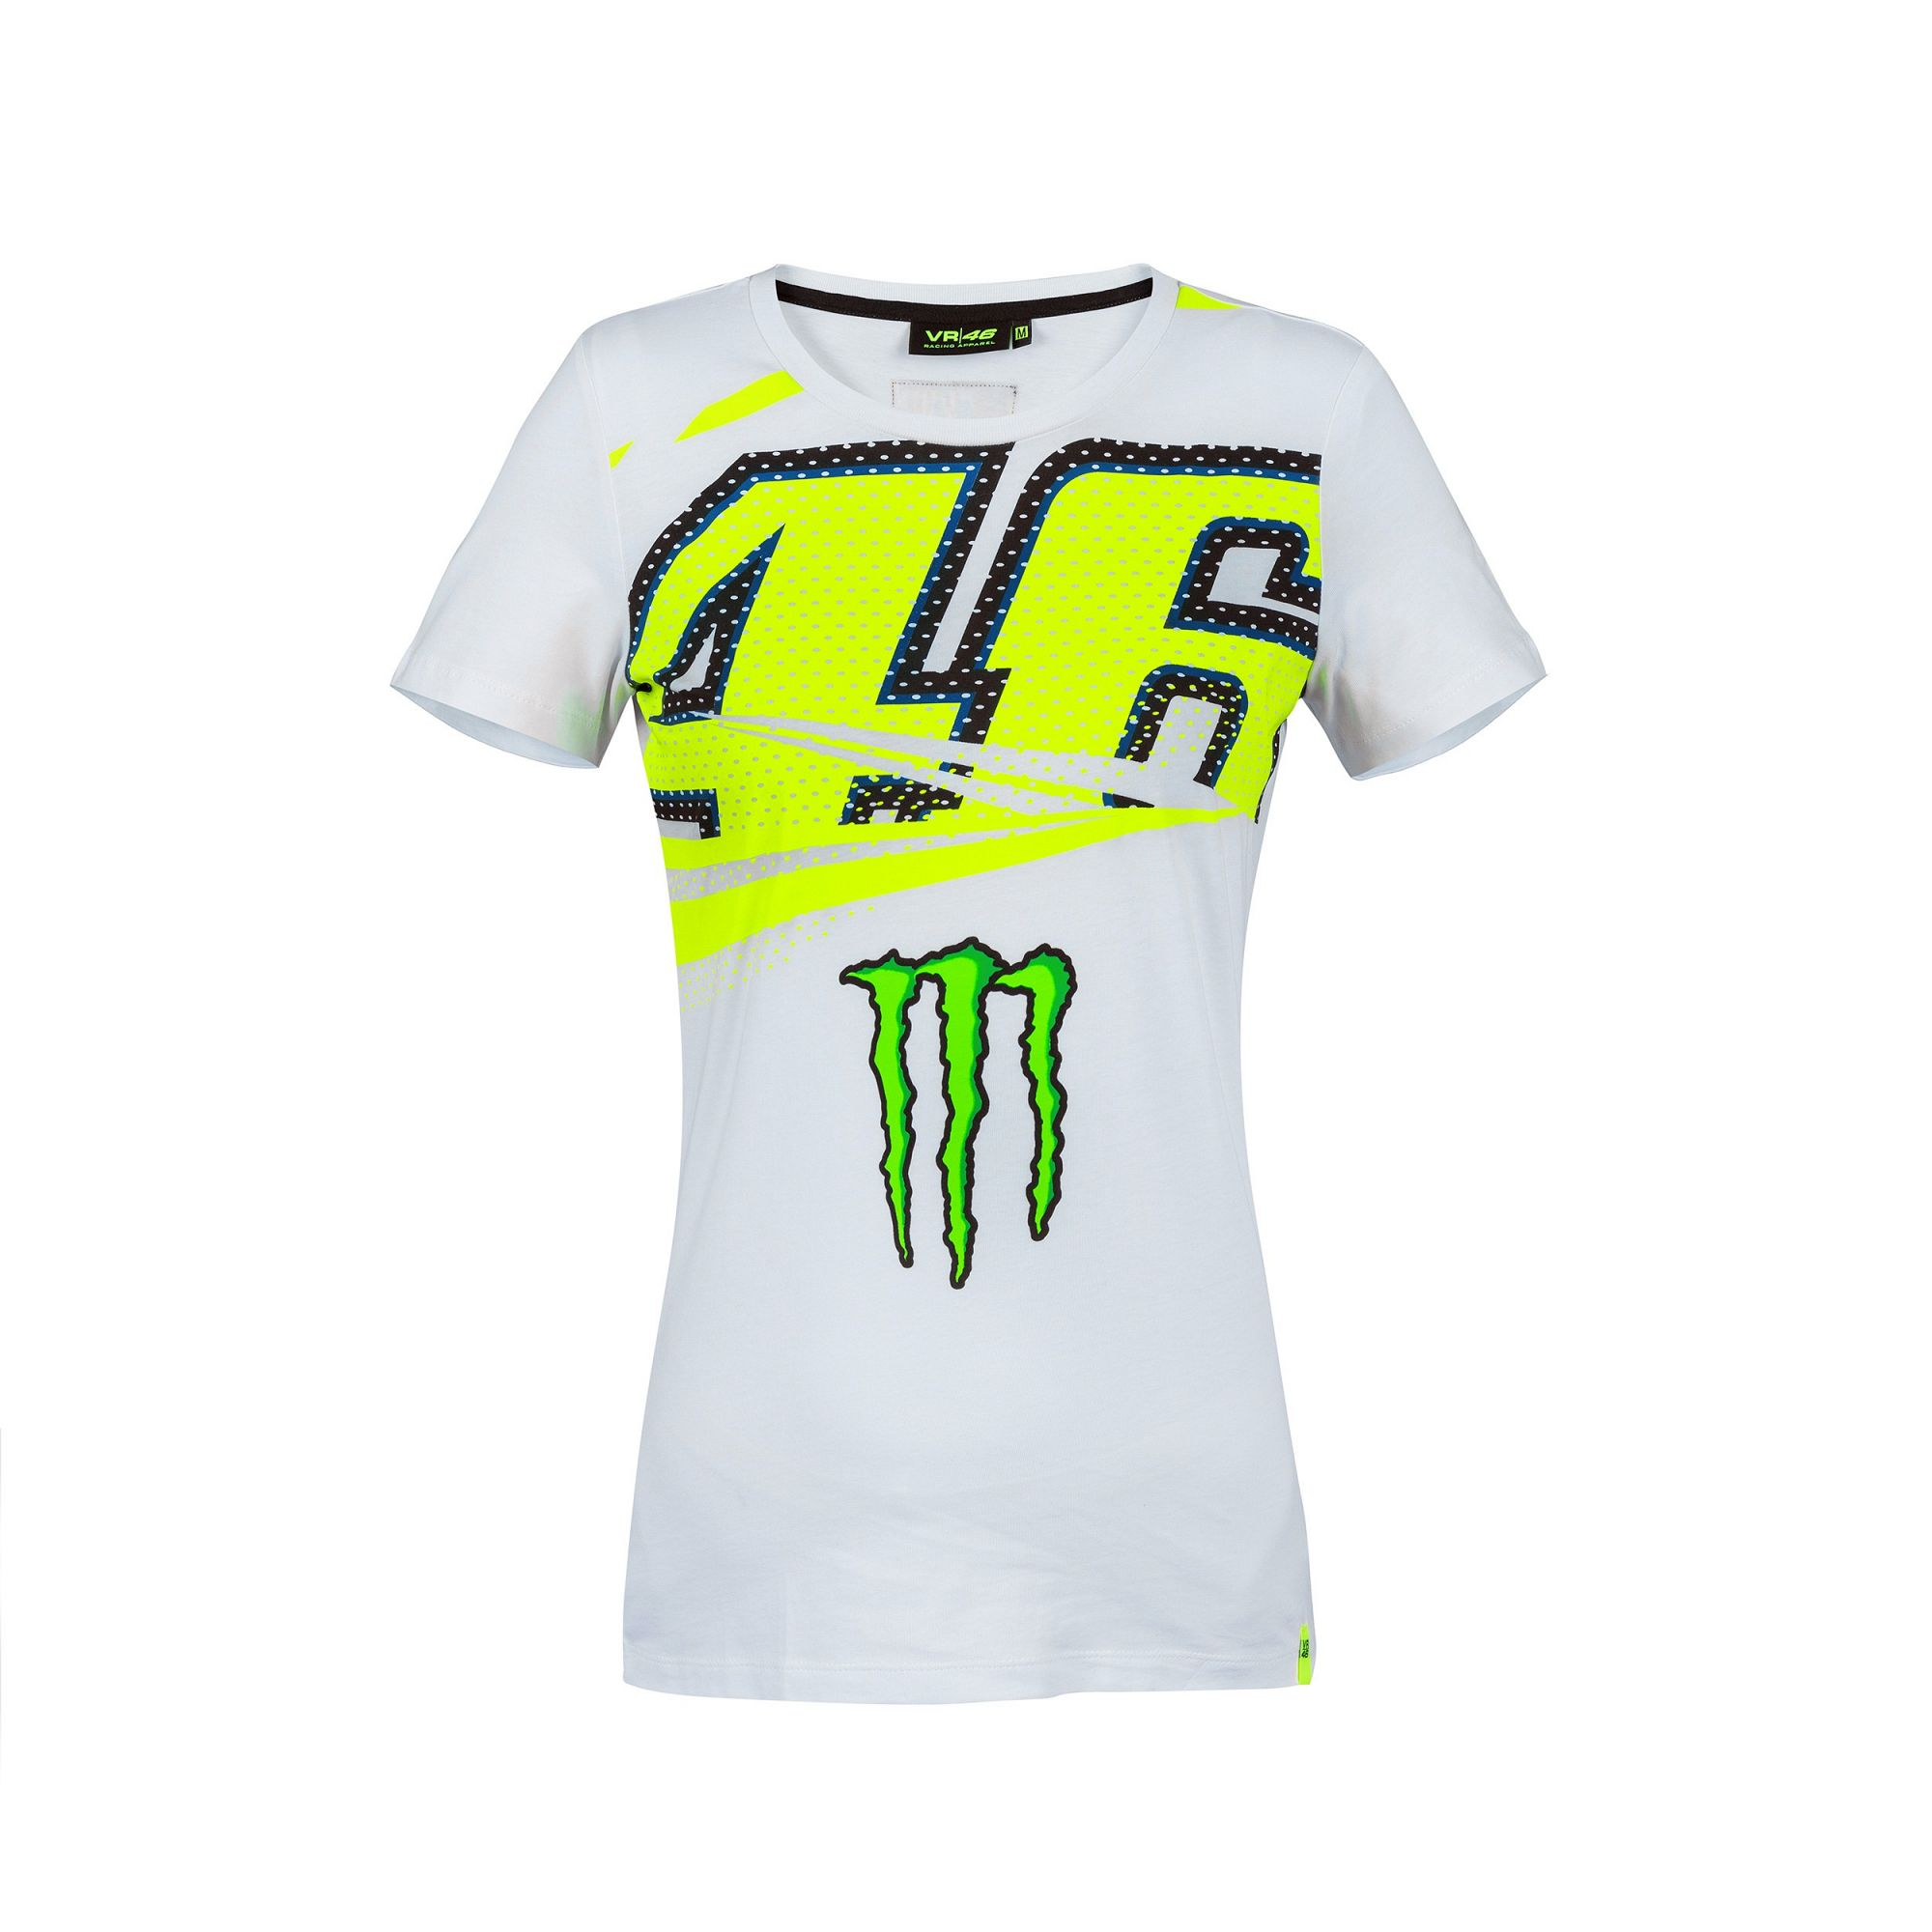 bcb78202 Sentinel 2018 VR46 Valentino Rossi #46 MotoGP Ladies Womens T-Shirt Tee  Monster Energy